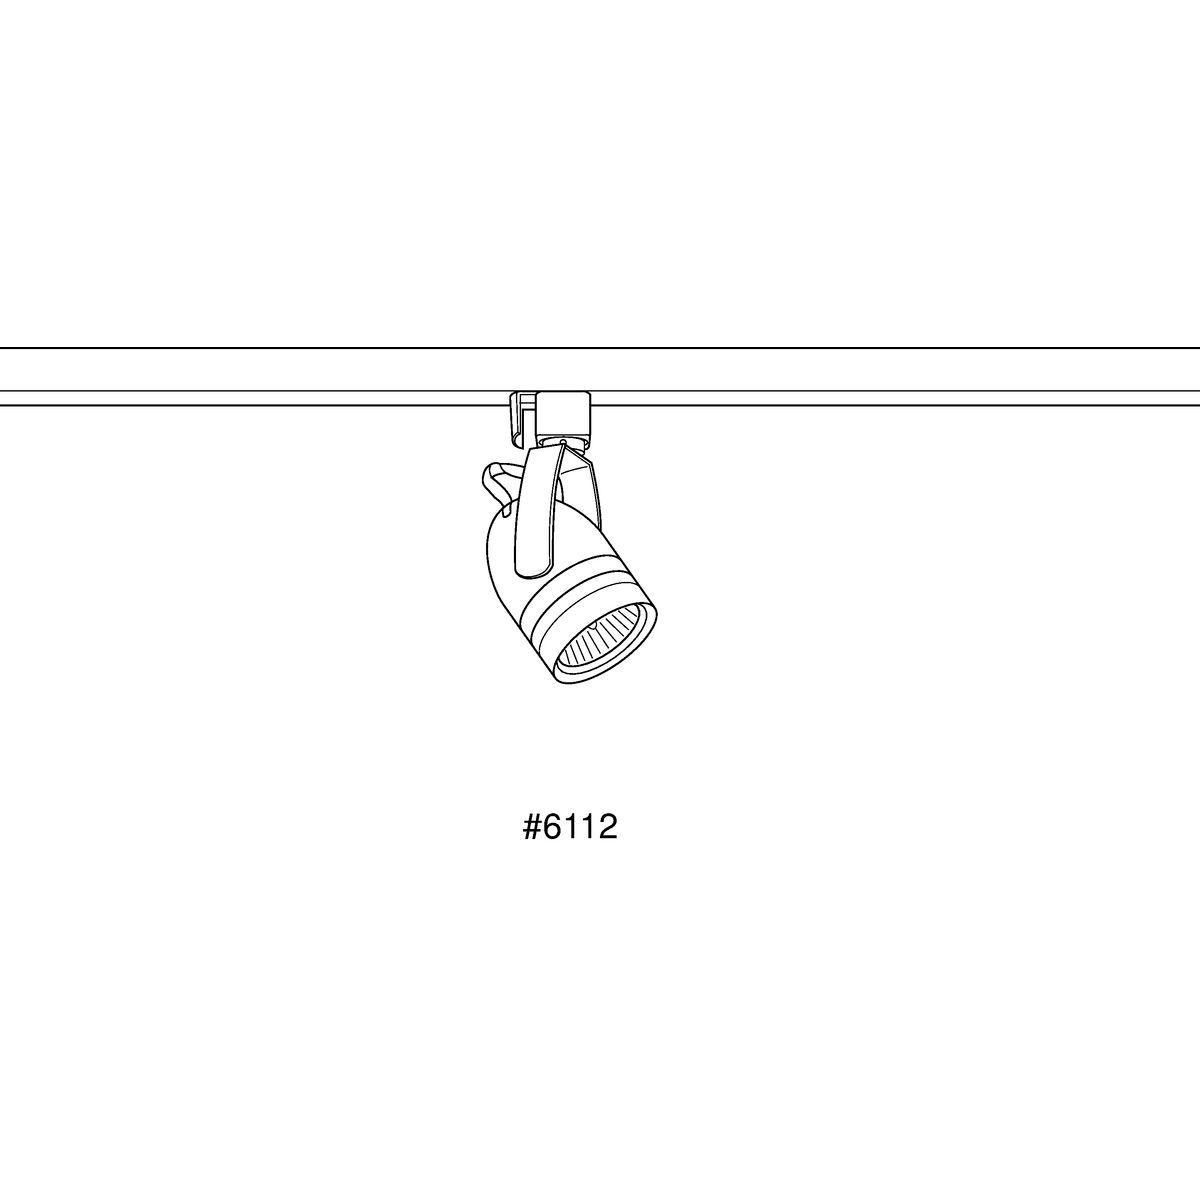 Progp611209prodimage Progp6112lineart: Hubbell Lighting Inverter Wiring Diagram At Chusao.net